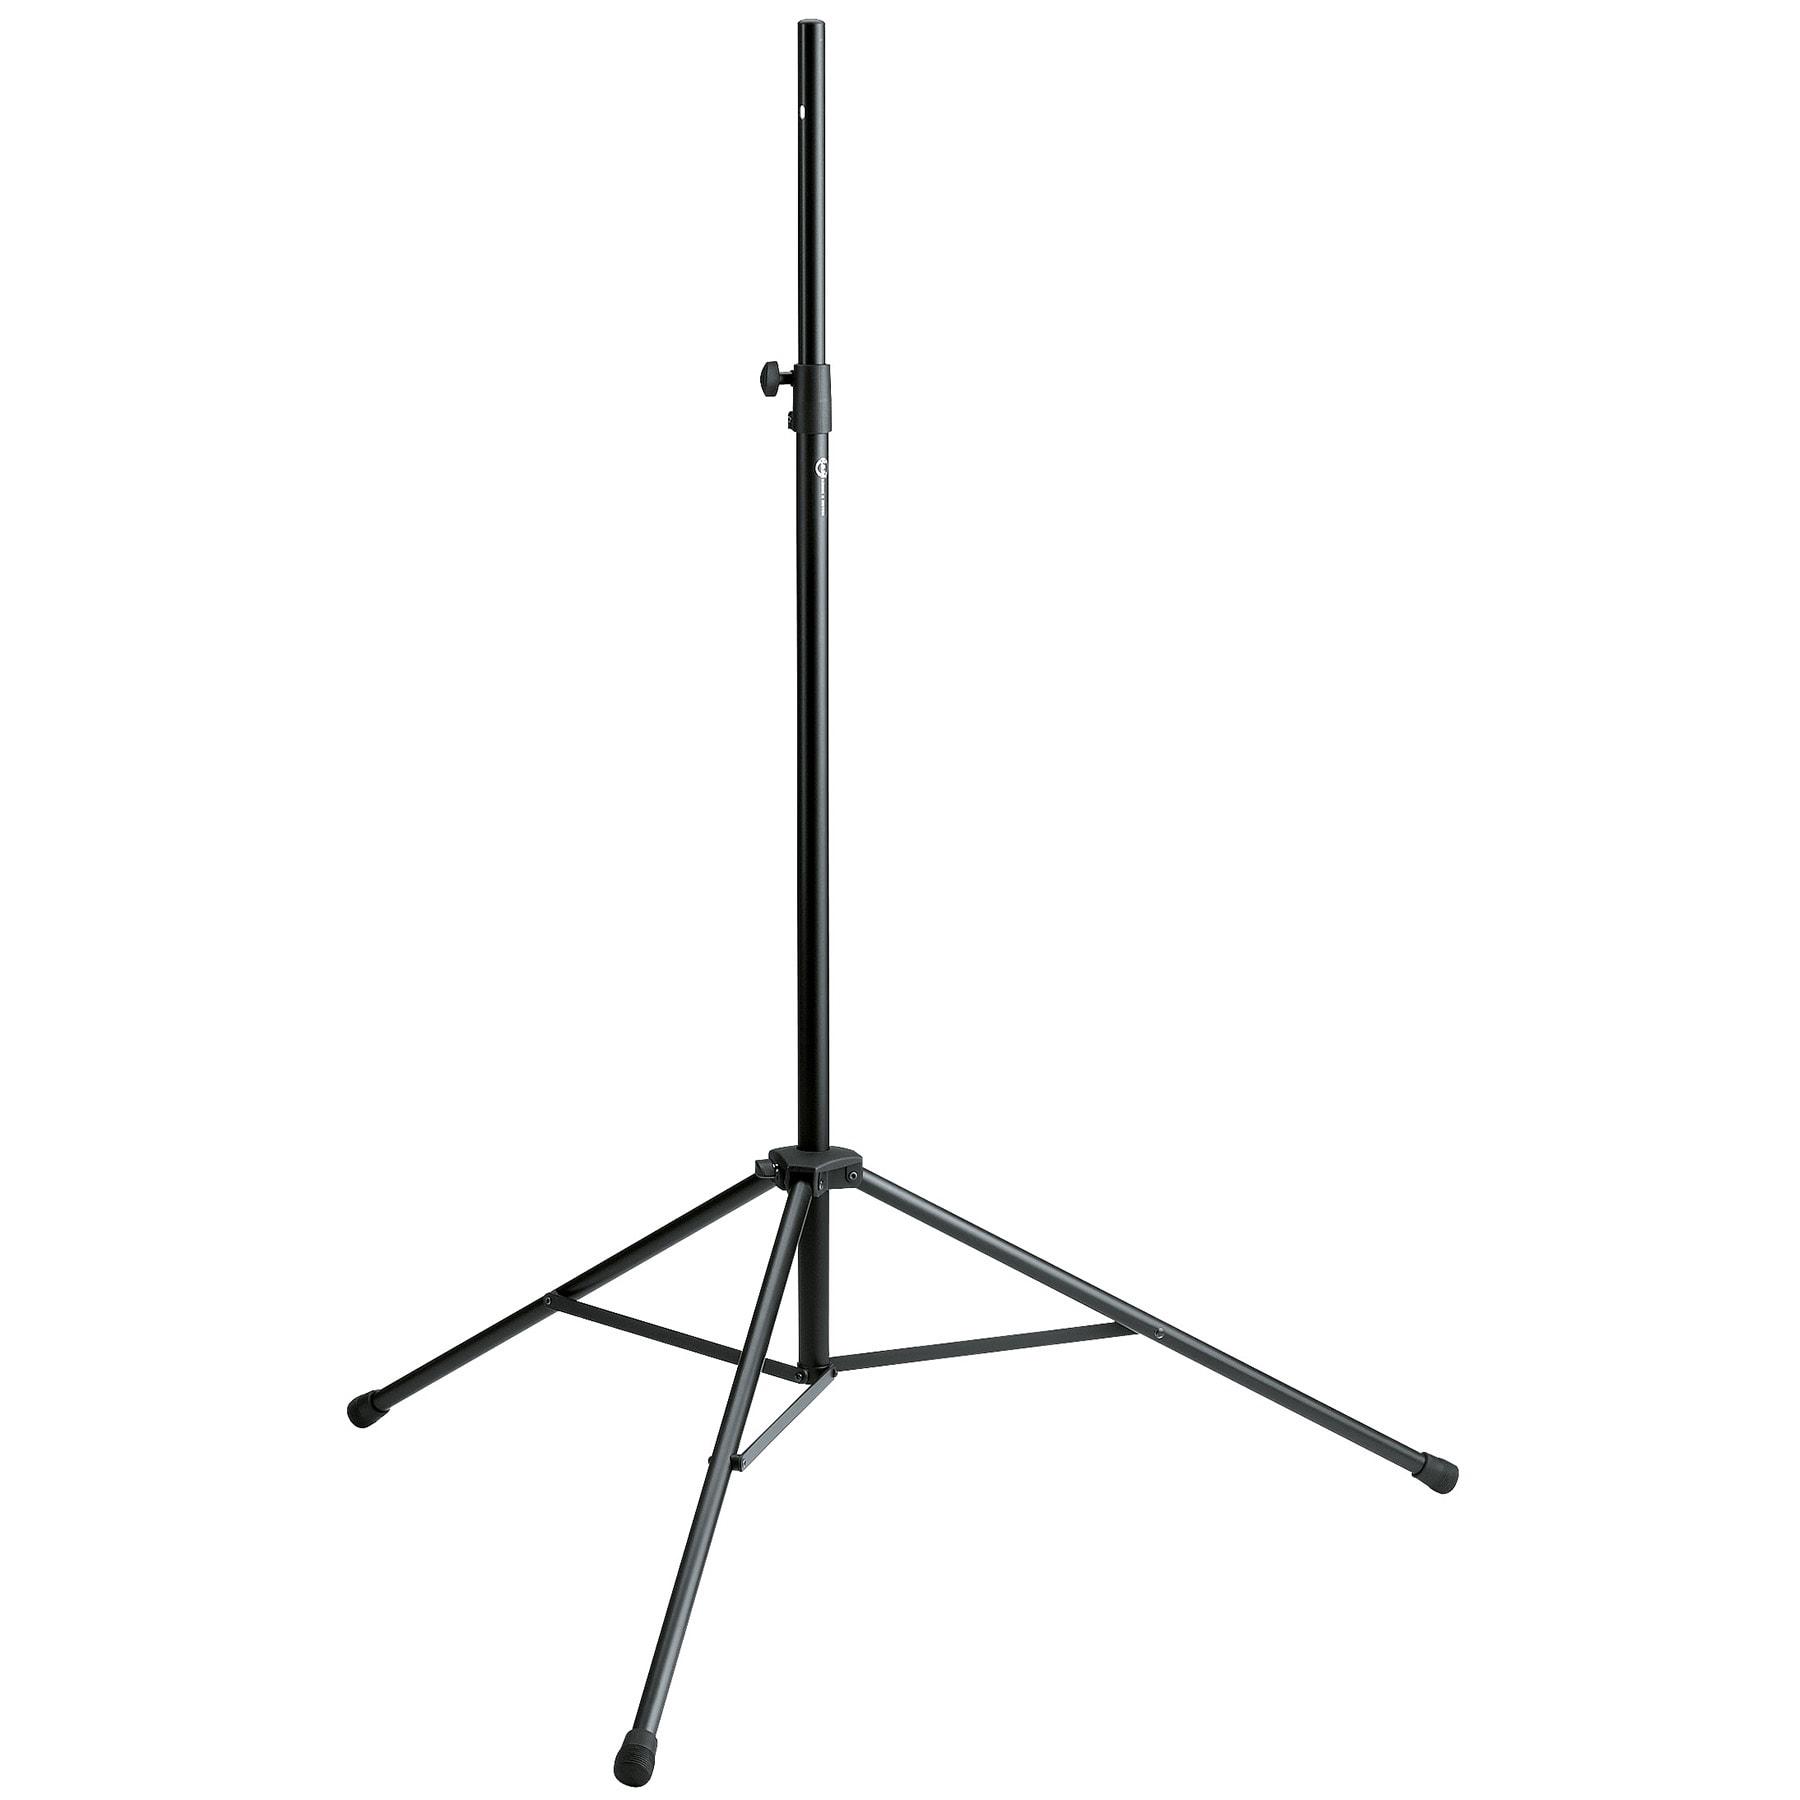 KM21420 - Speaker/monitor stand